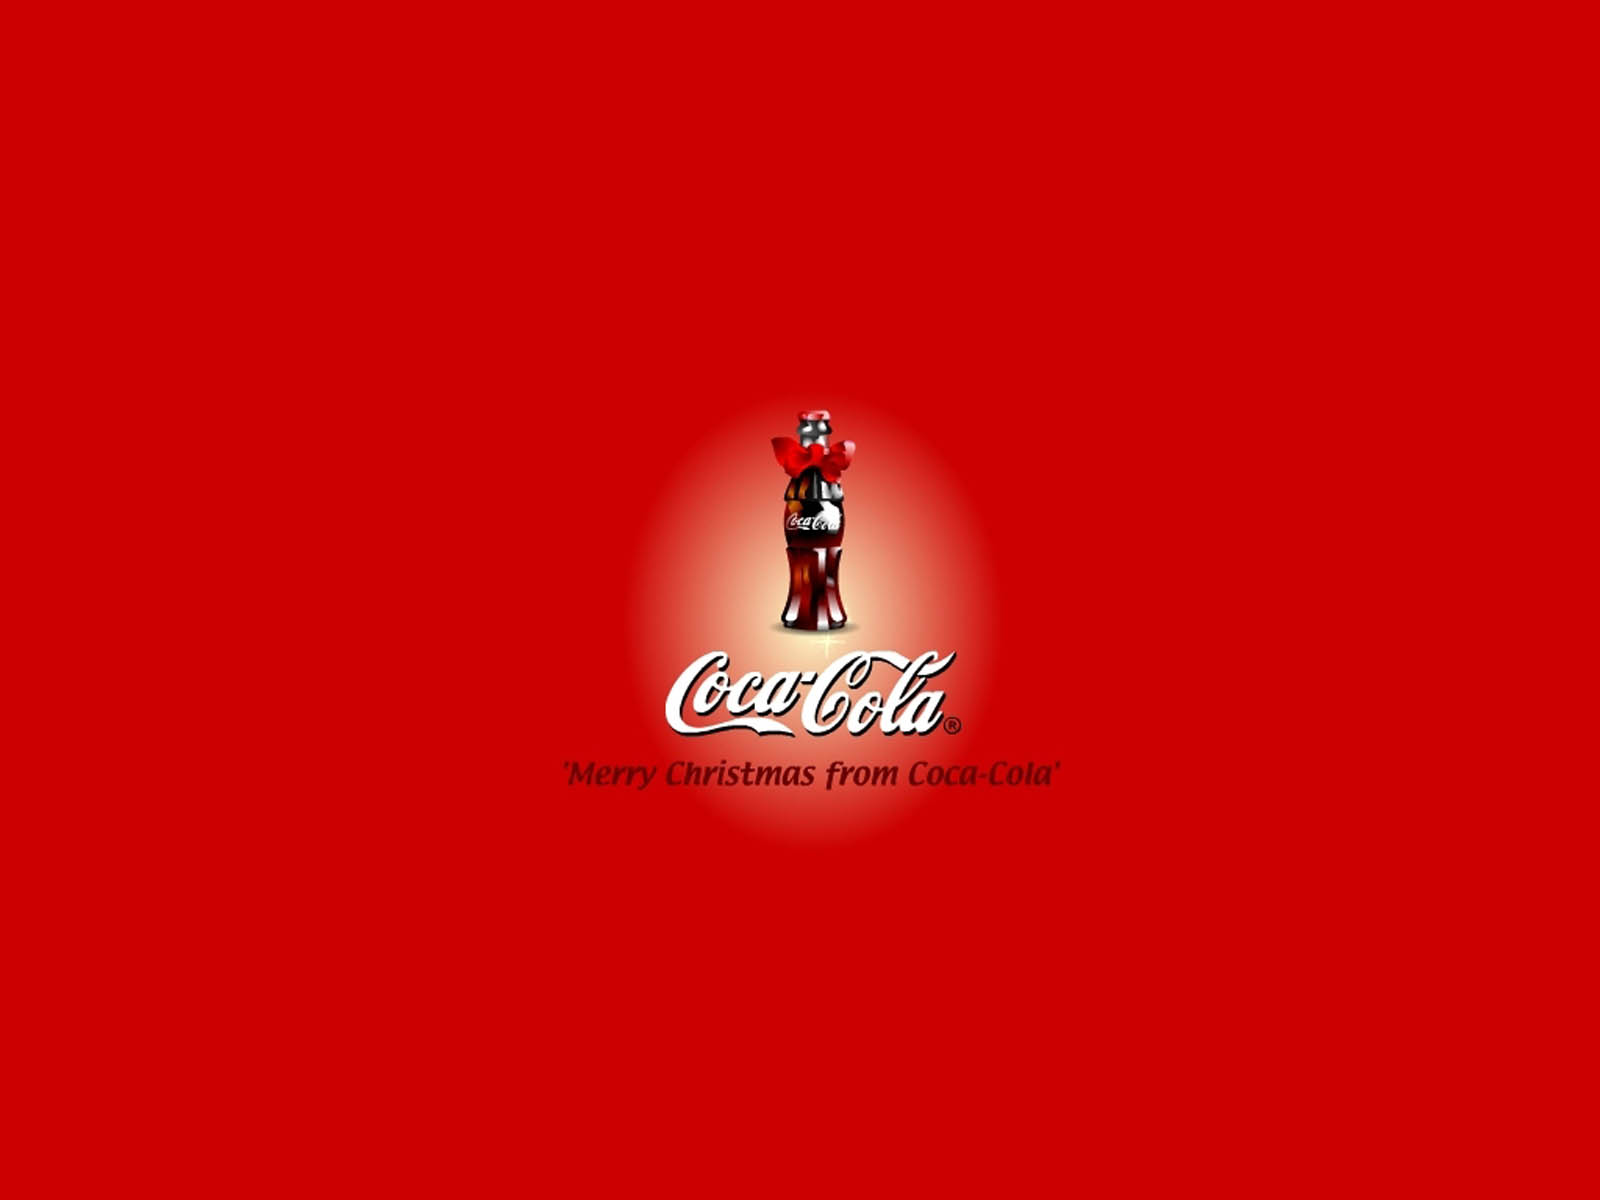 wallpapers: Coca Cola Wallpapers